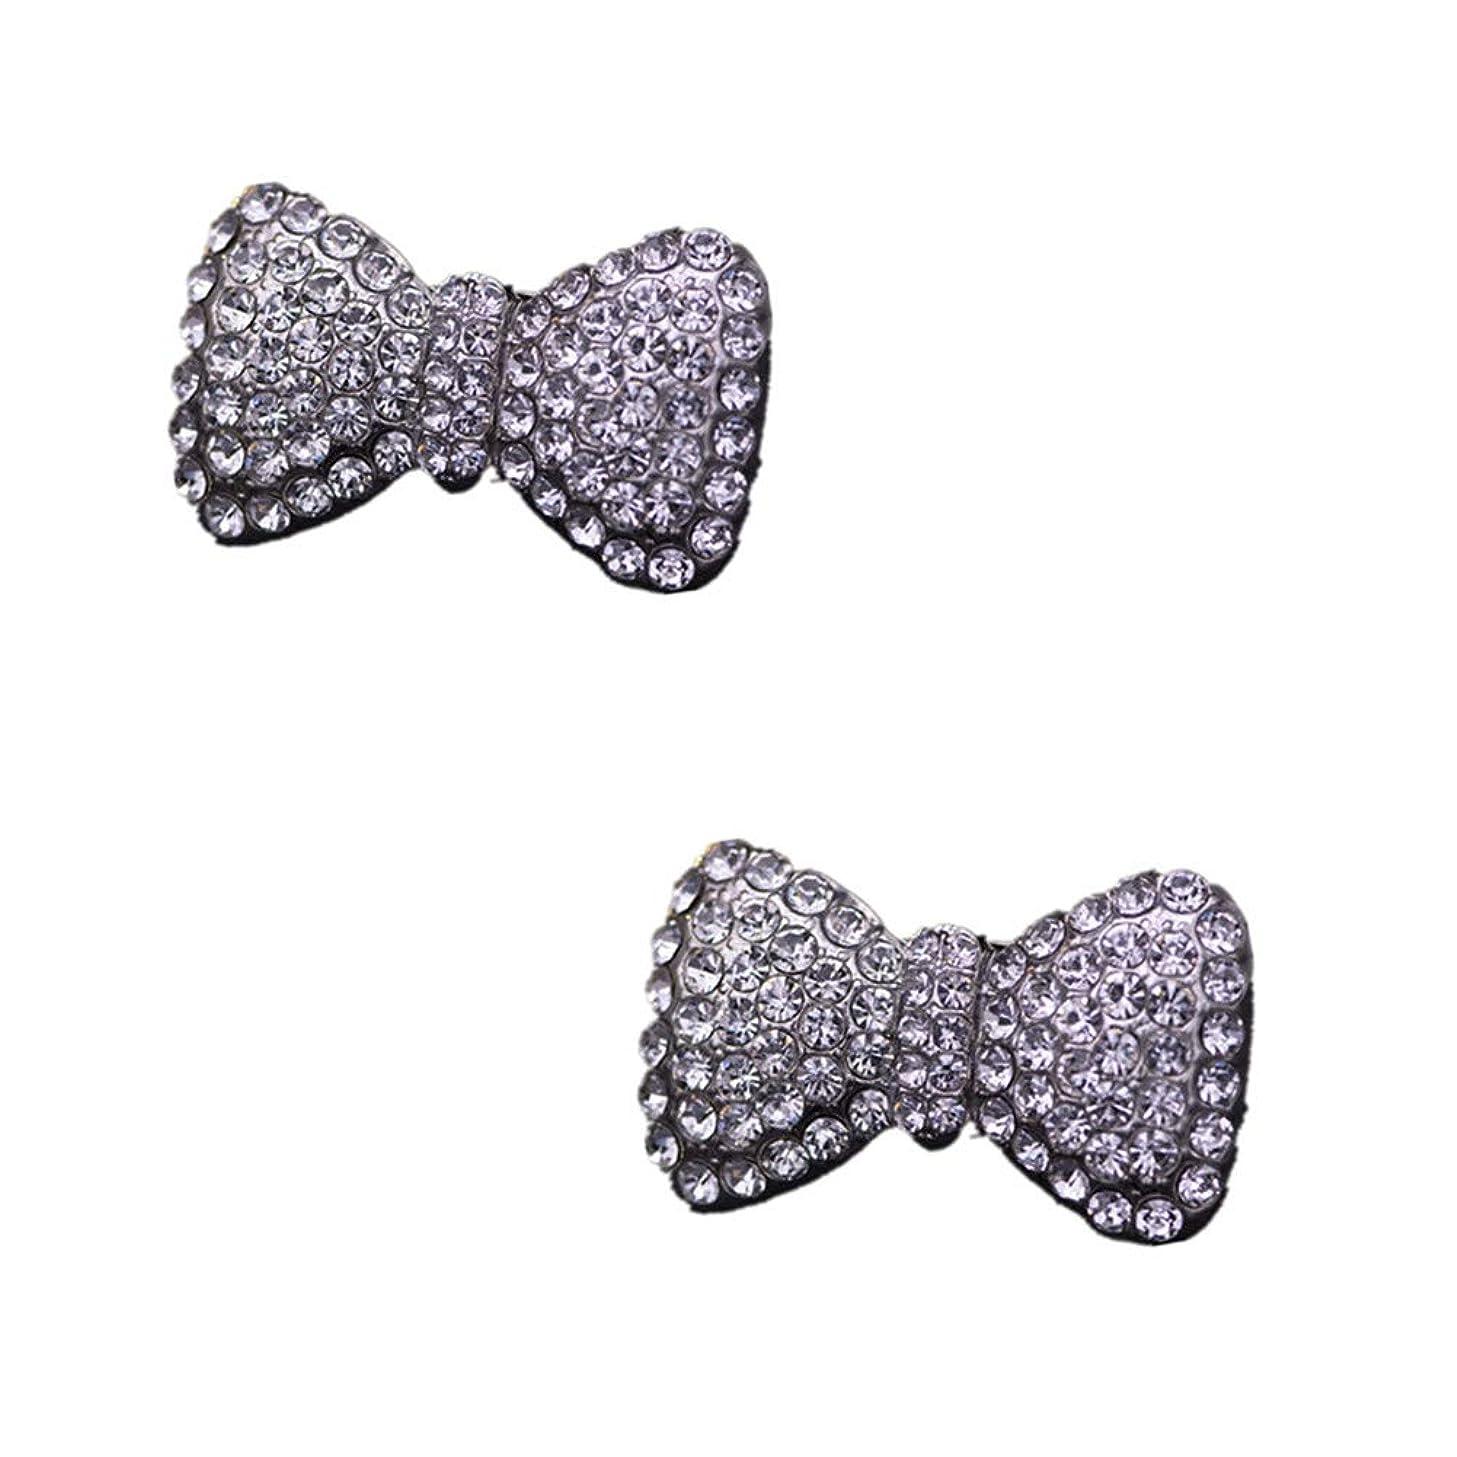 Douqu Rhinestone Crystal Pearl Silver Gold Bow Wedding Bridal High Heel Shoe Clips Removable Shoe Charms-2 Pcs (Silver Rhinestone)